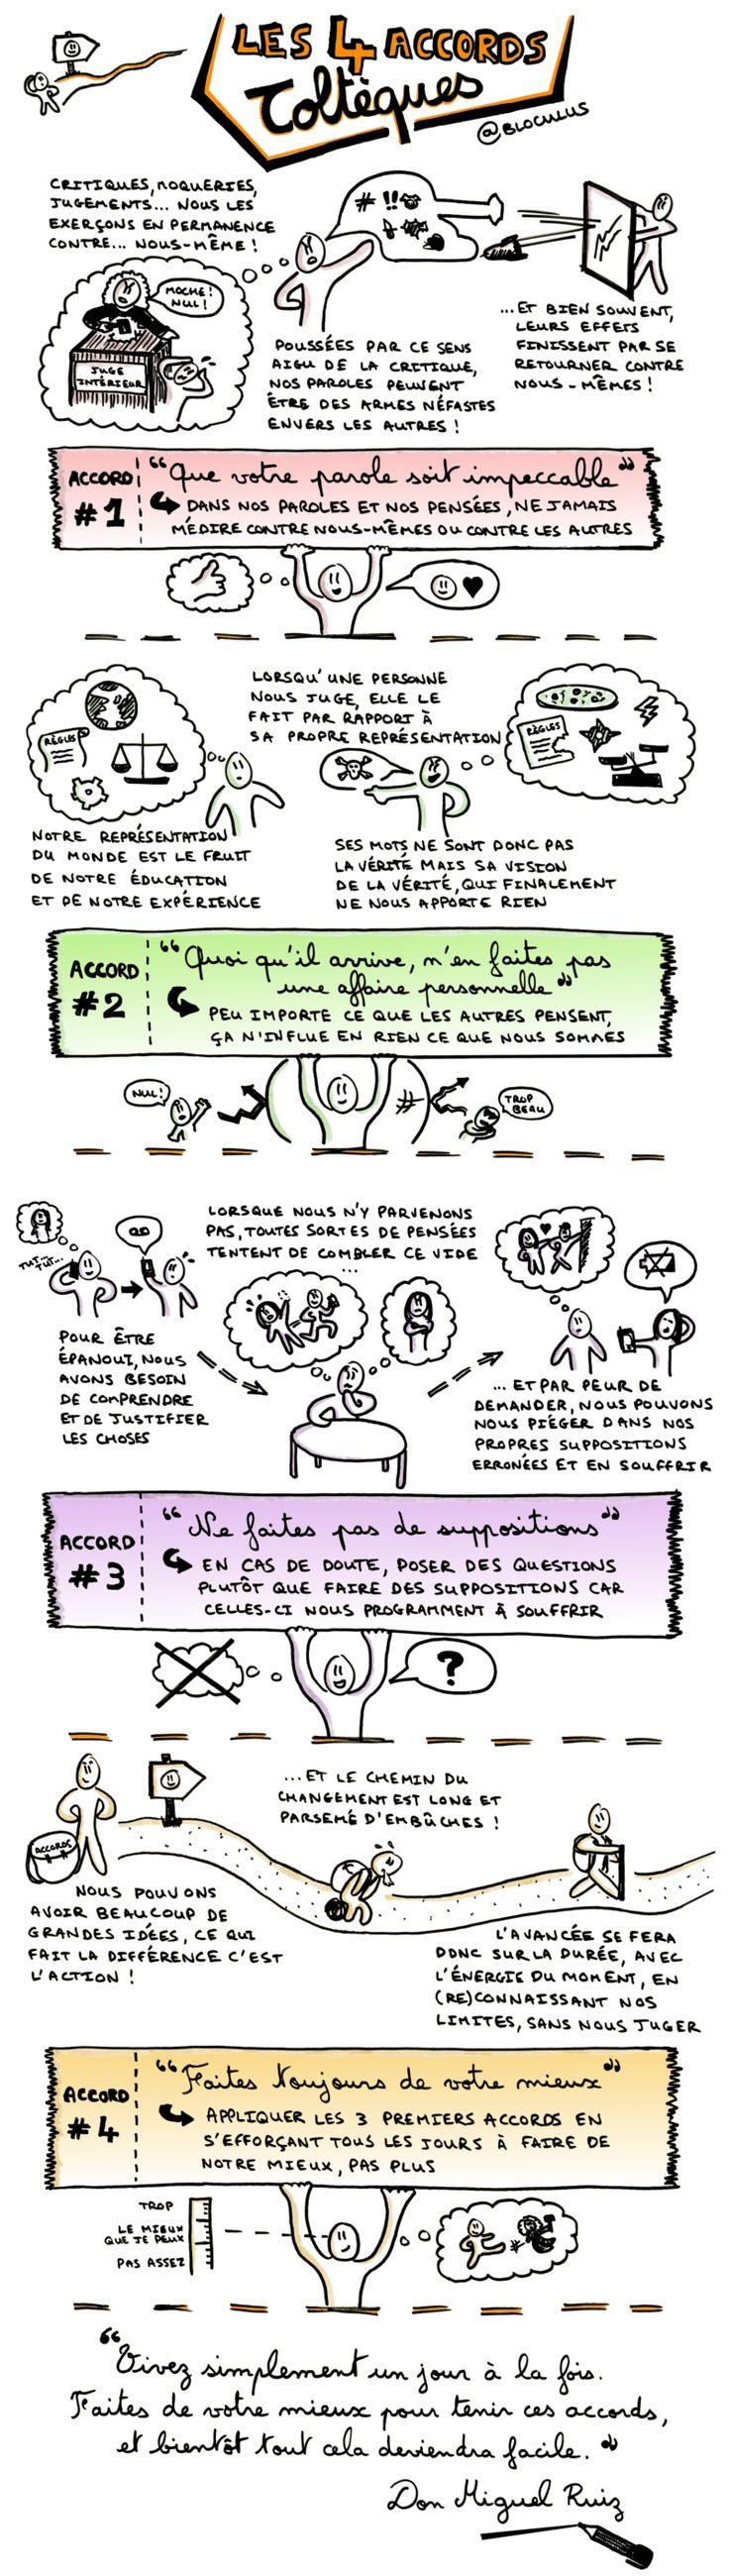 Psychology-Infographic-Sketchnote-4-accords-Toltèques Psychology Infographic : Sketchnote 4 accords Toltèques